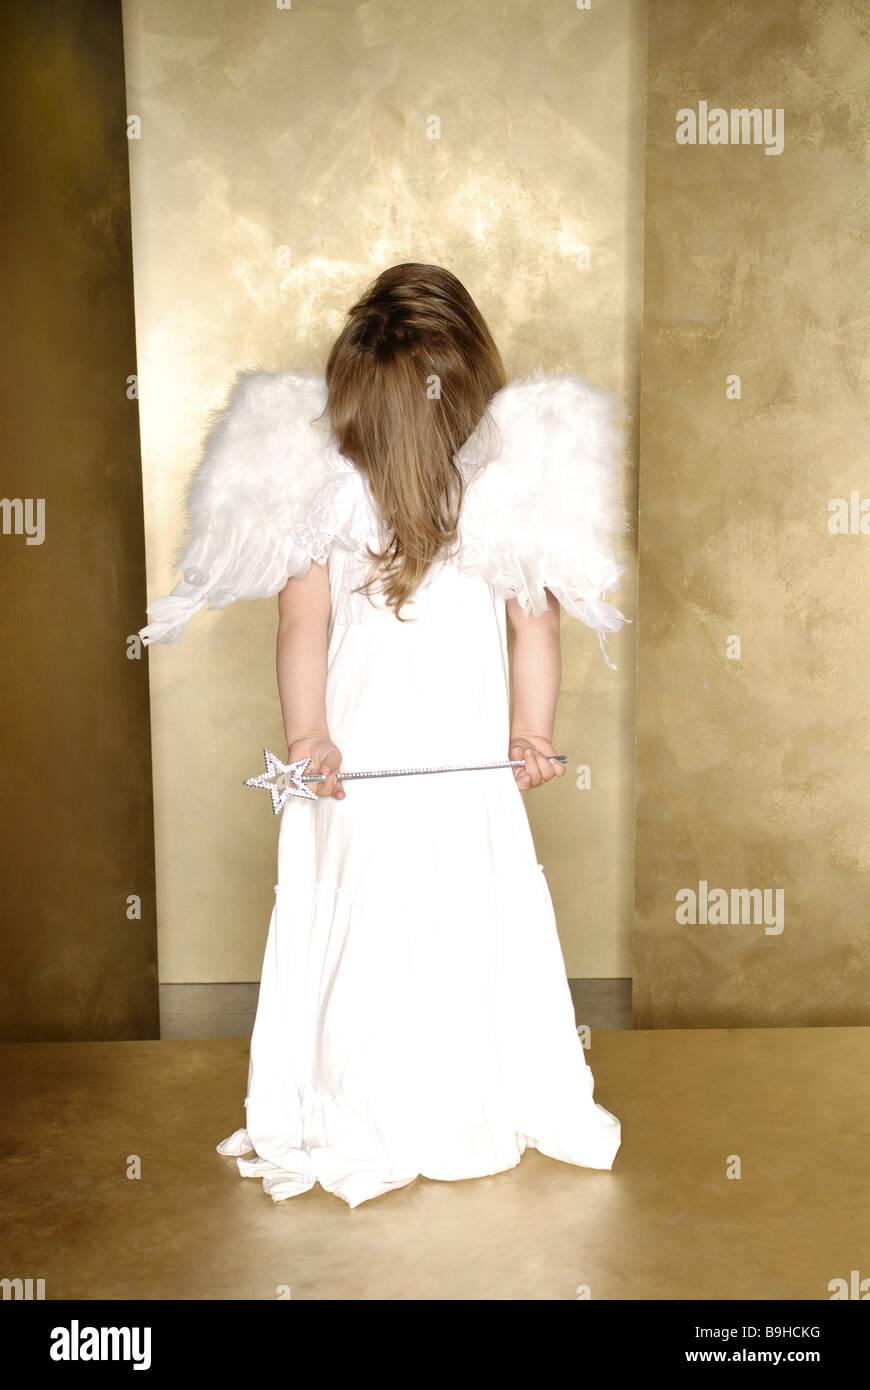 Child Girl Angel Wings Magic Wand Dress High Looks Back